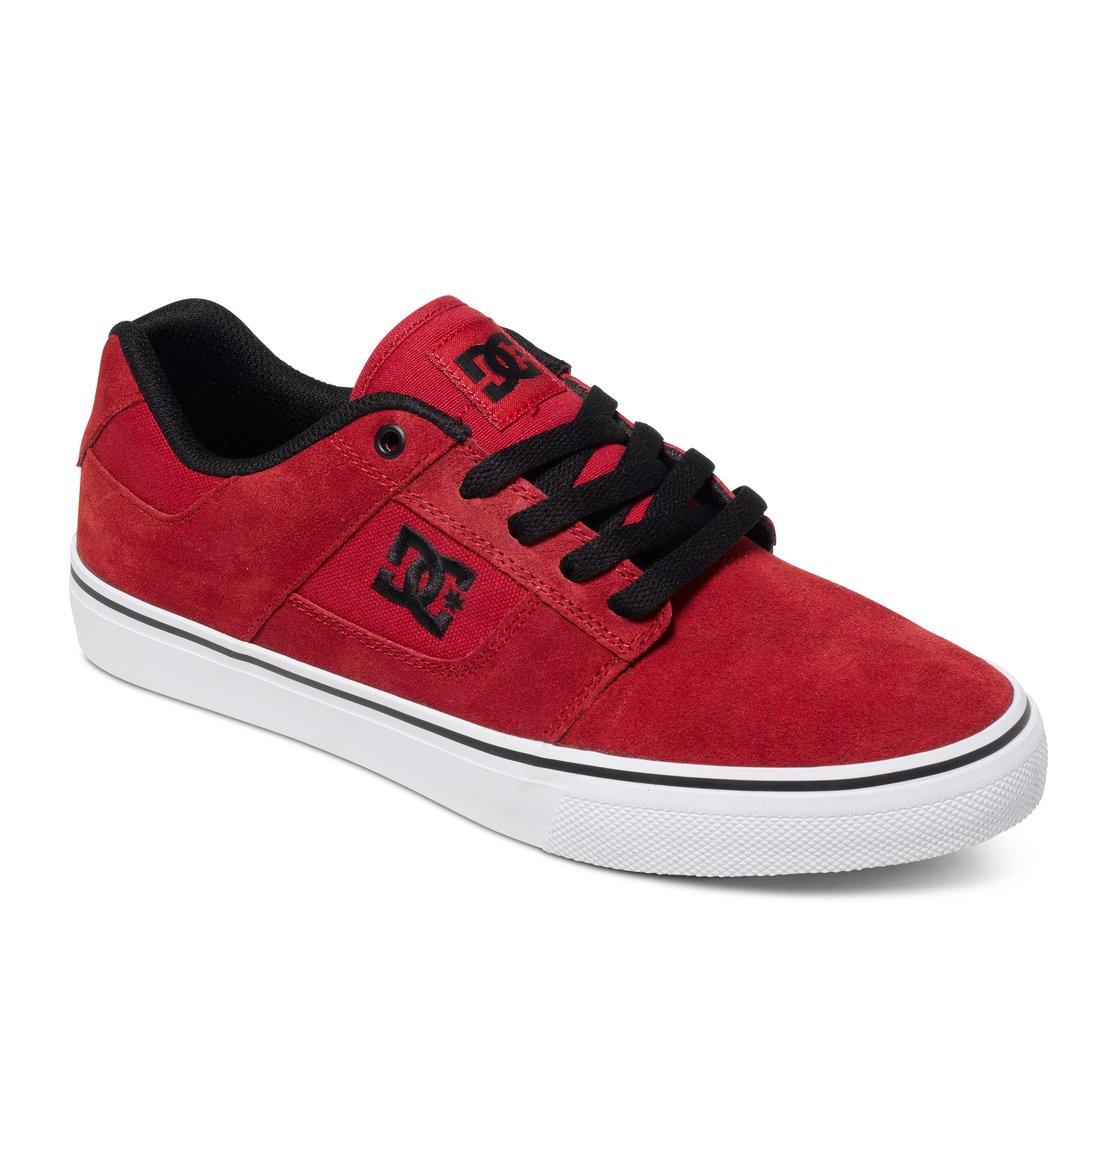 332c16d376845 1 Tênis masculino Bridge Vermelho BR320096 DC Shoes